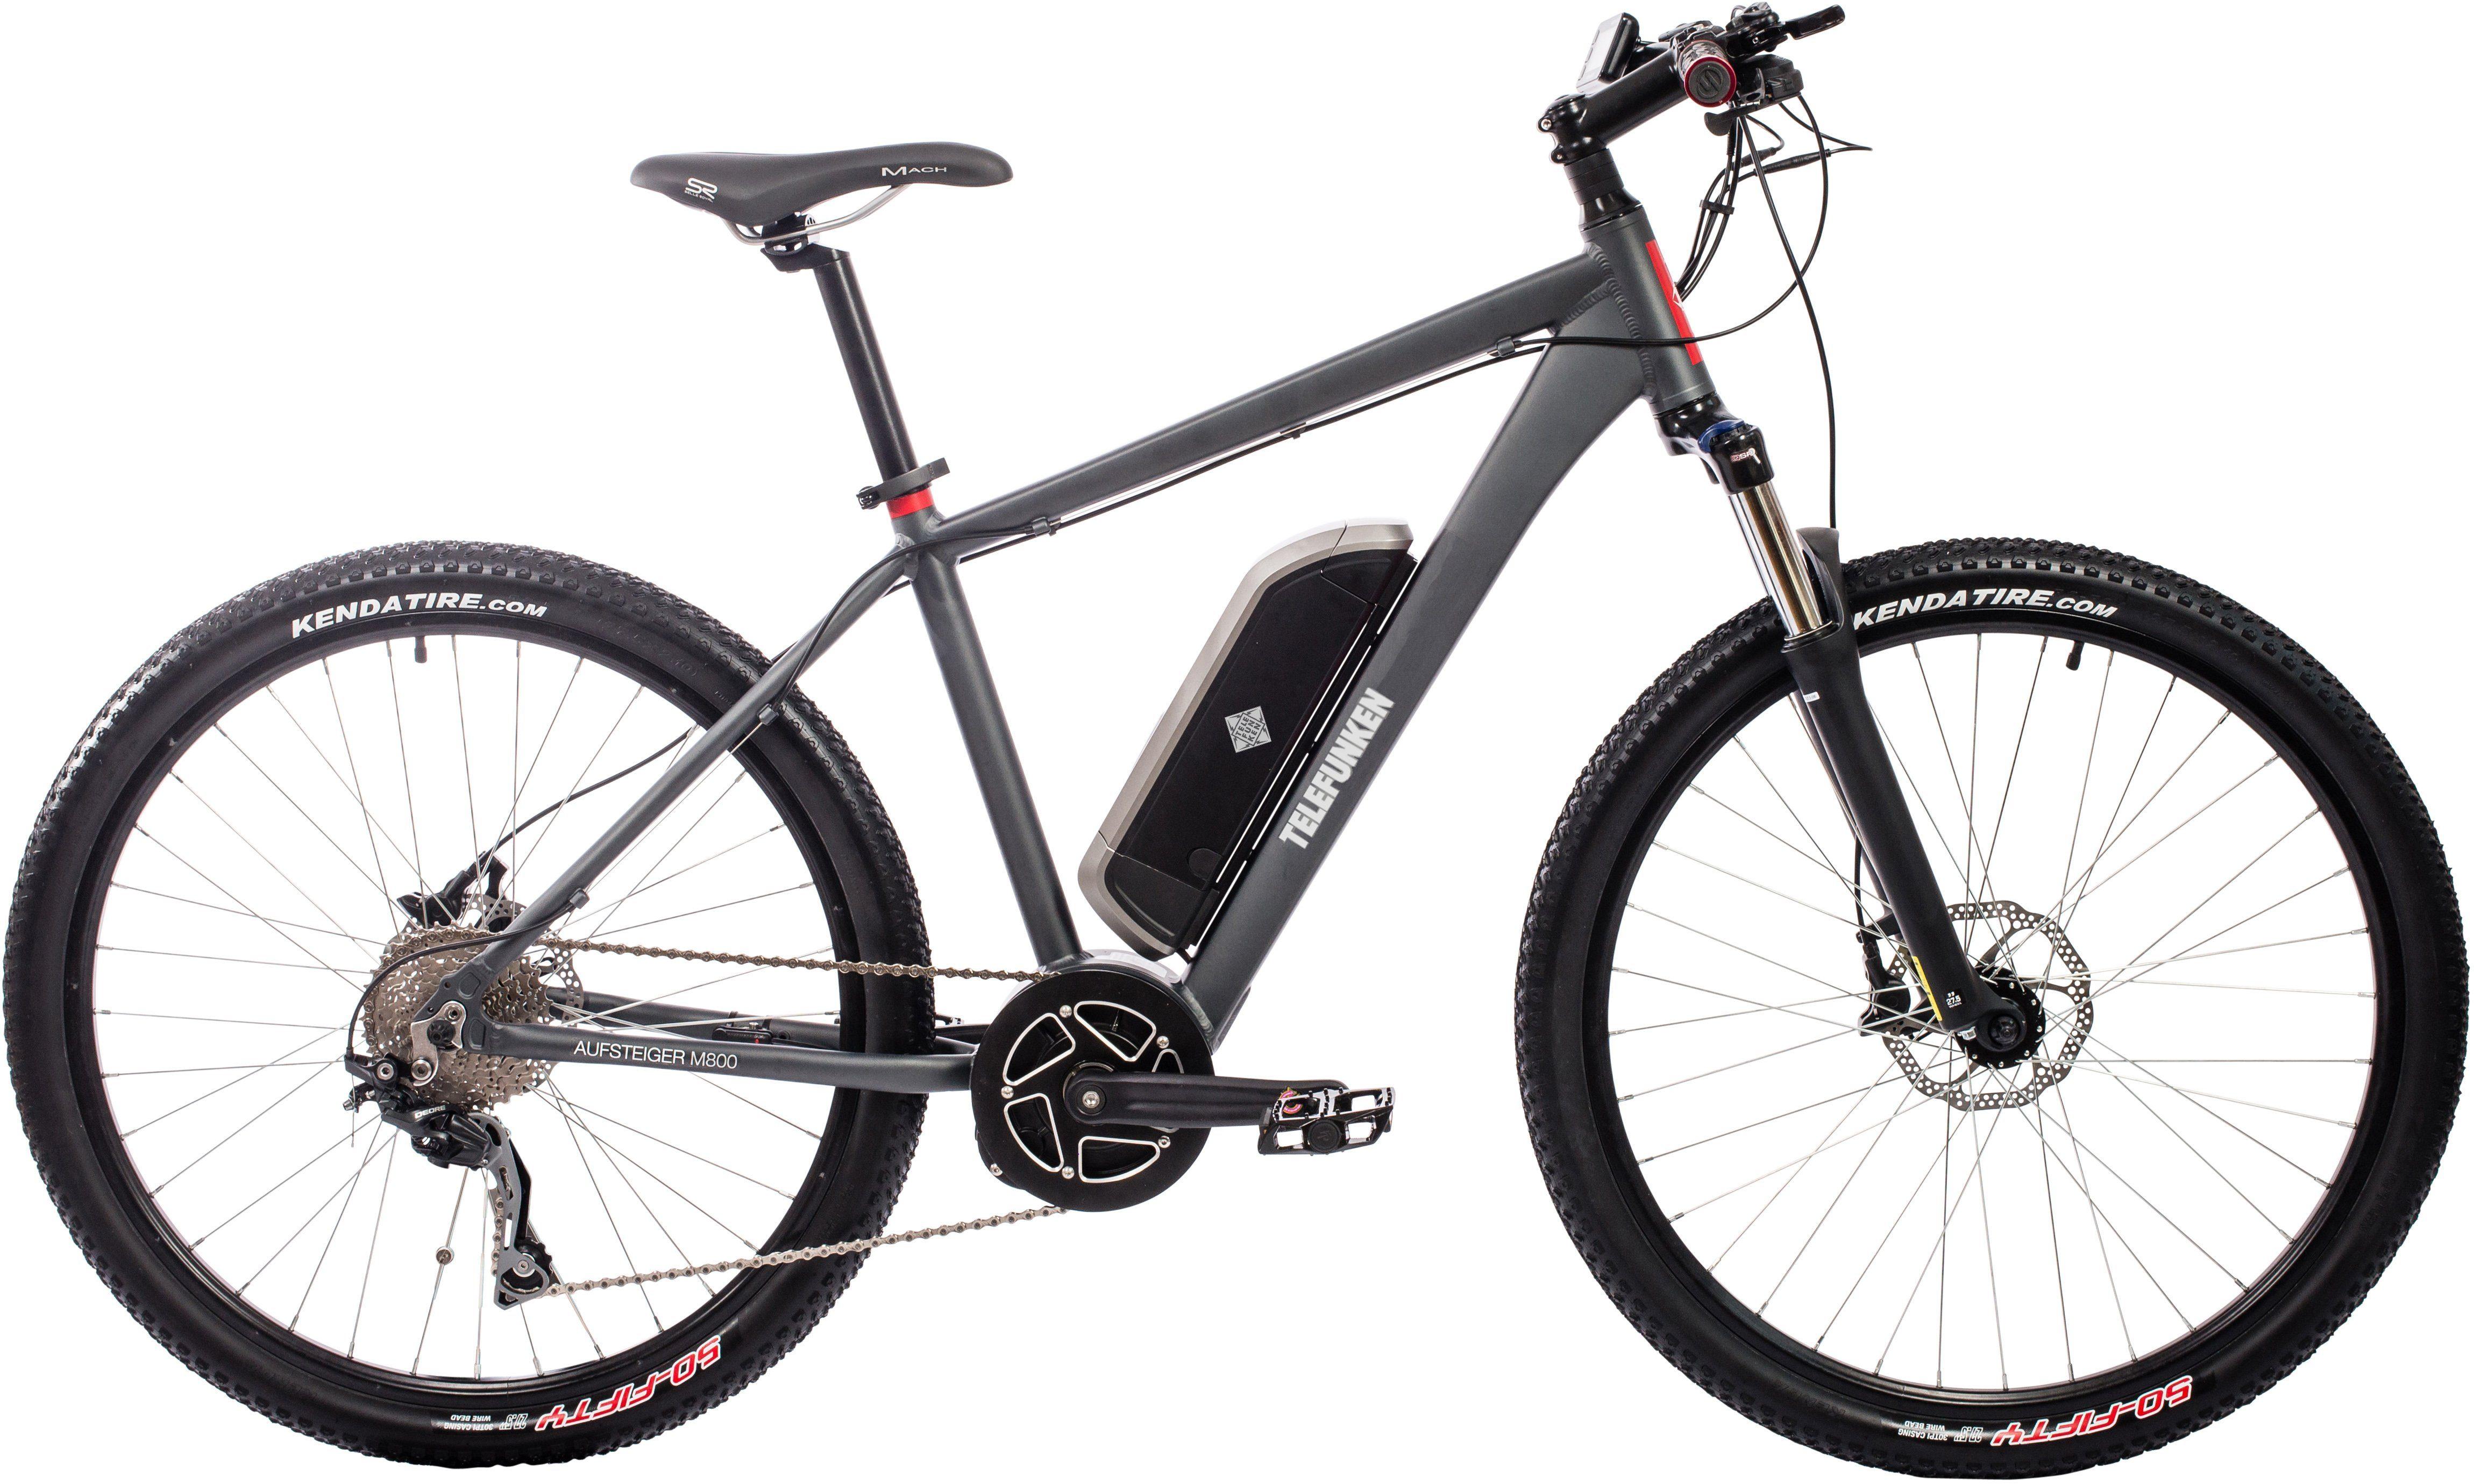 Telefunken Herren Alu Hardtail MTB-E-Bike, 27,5 Z., 10-Gg. Shim. Deore Kettensch., Mittelmotor, »Aufsteiger M800«